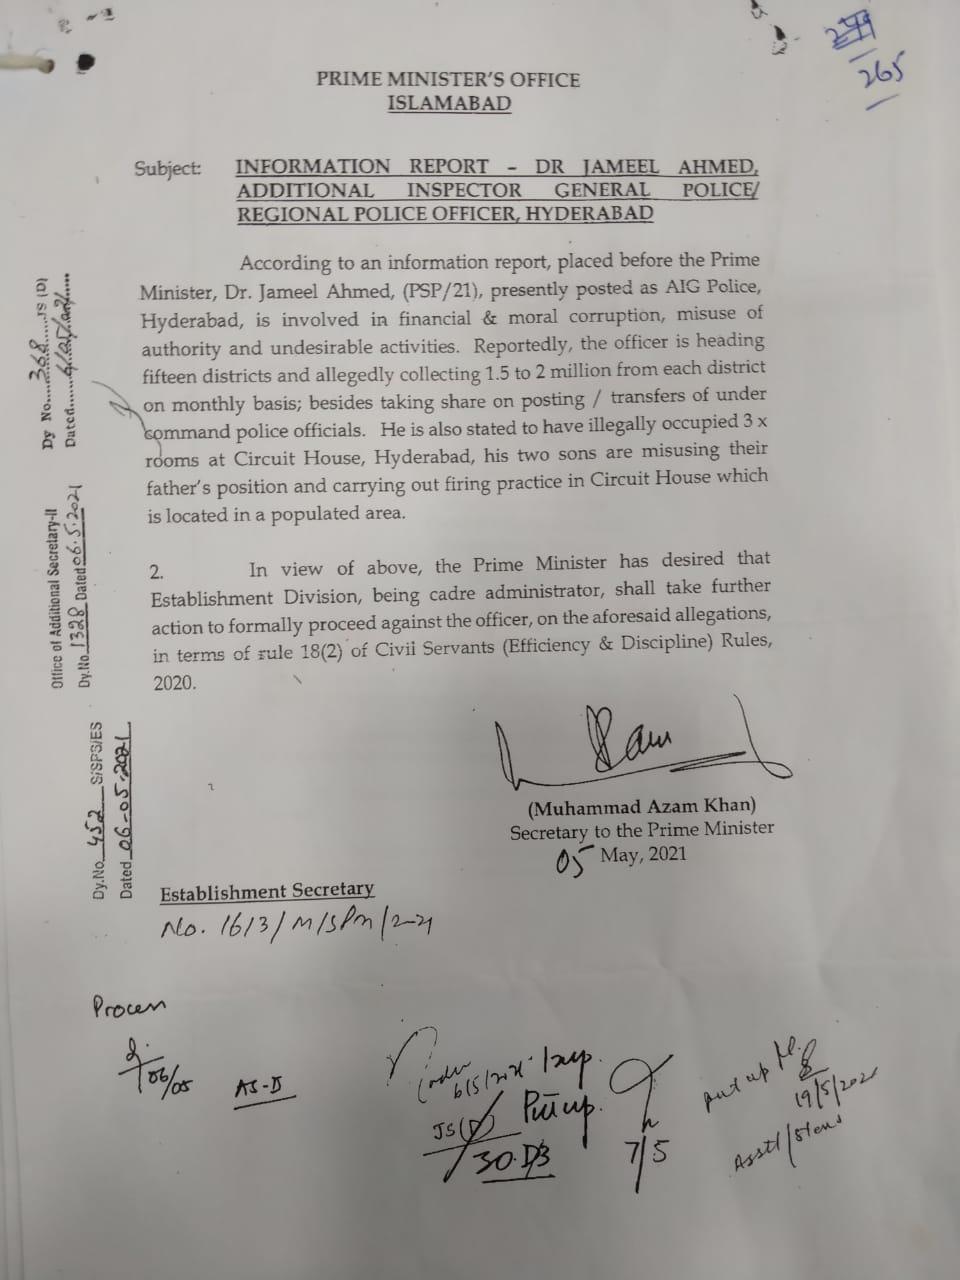 PM Imran Khan pens letter to Establishment Division.